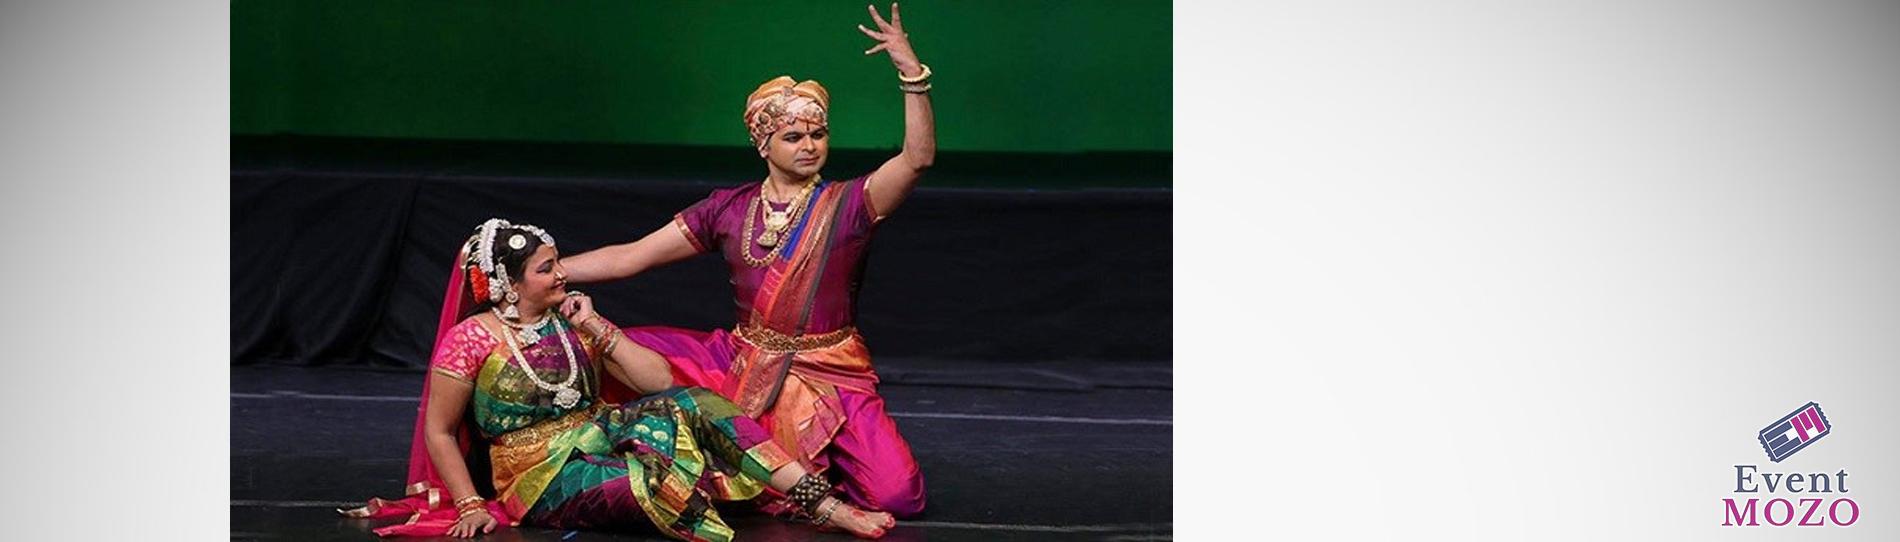 EventMozo Evening of Indian Dance